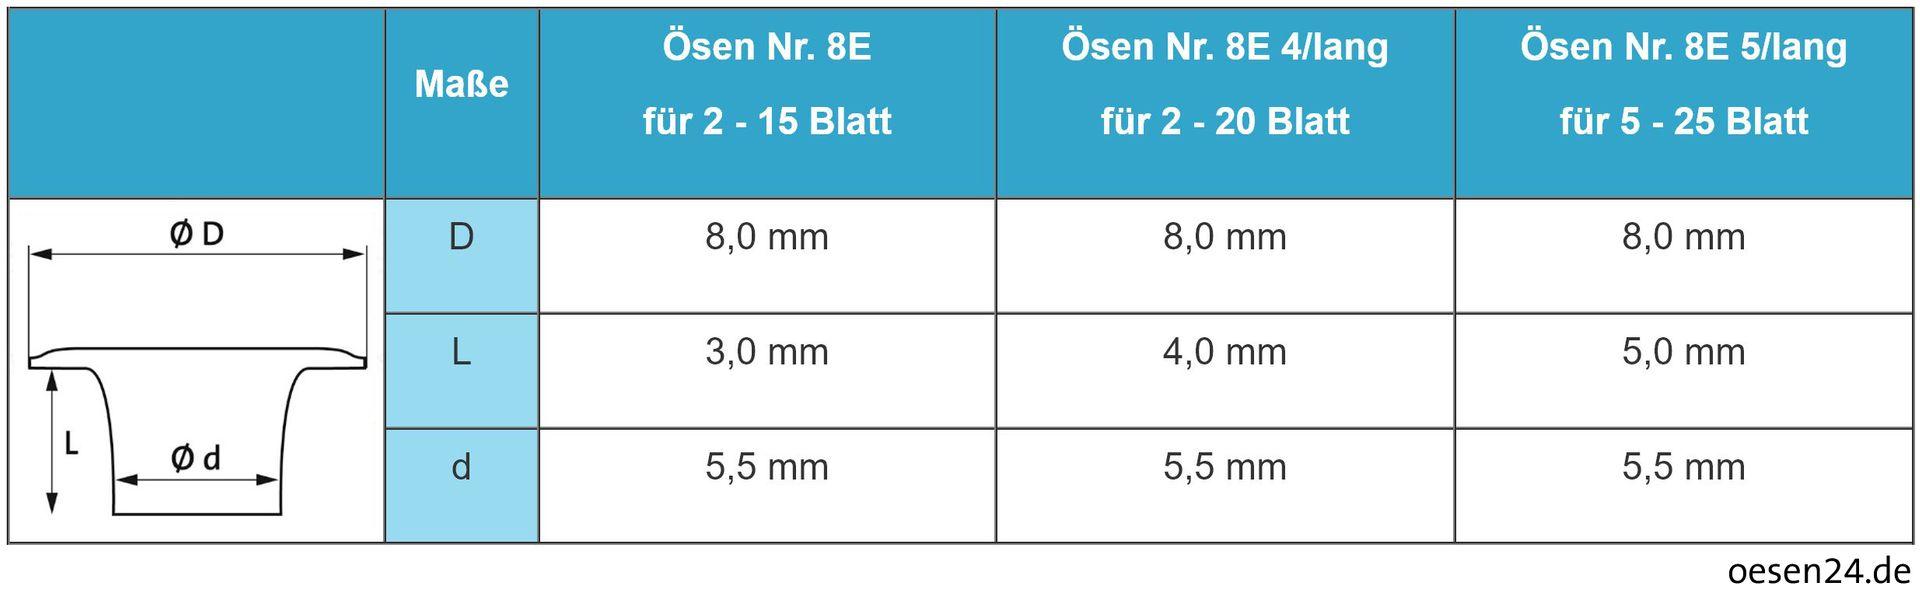 Hang elektrische Ösmaschine Piccostar 102-50 für Ösen Nr. 8E, 8E/4 und 8E/5 – Bild 2